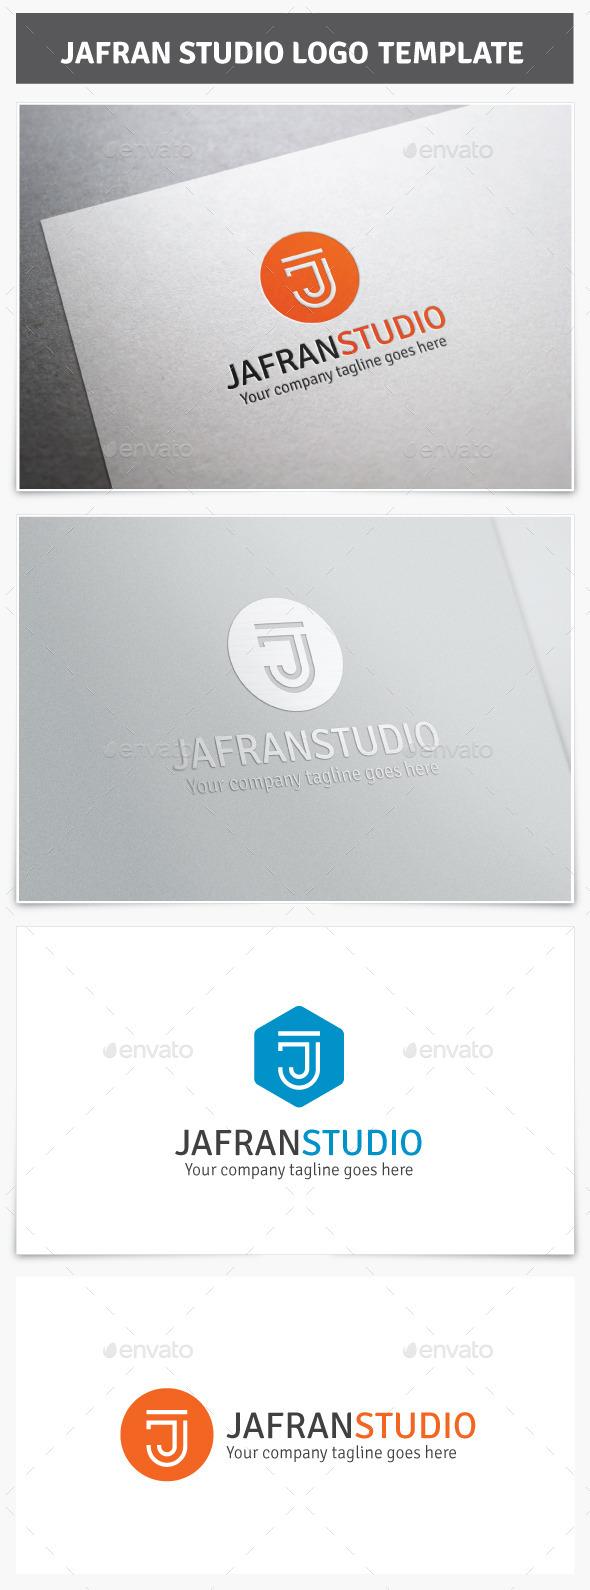 GraphicRiver Jafran Studio Logo 9457640